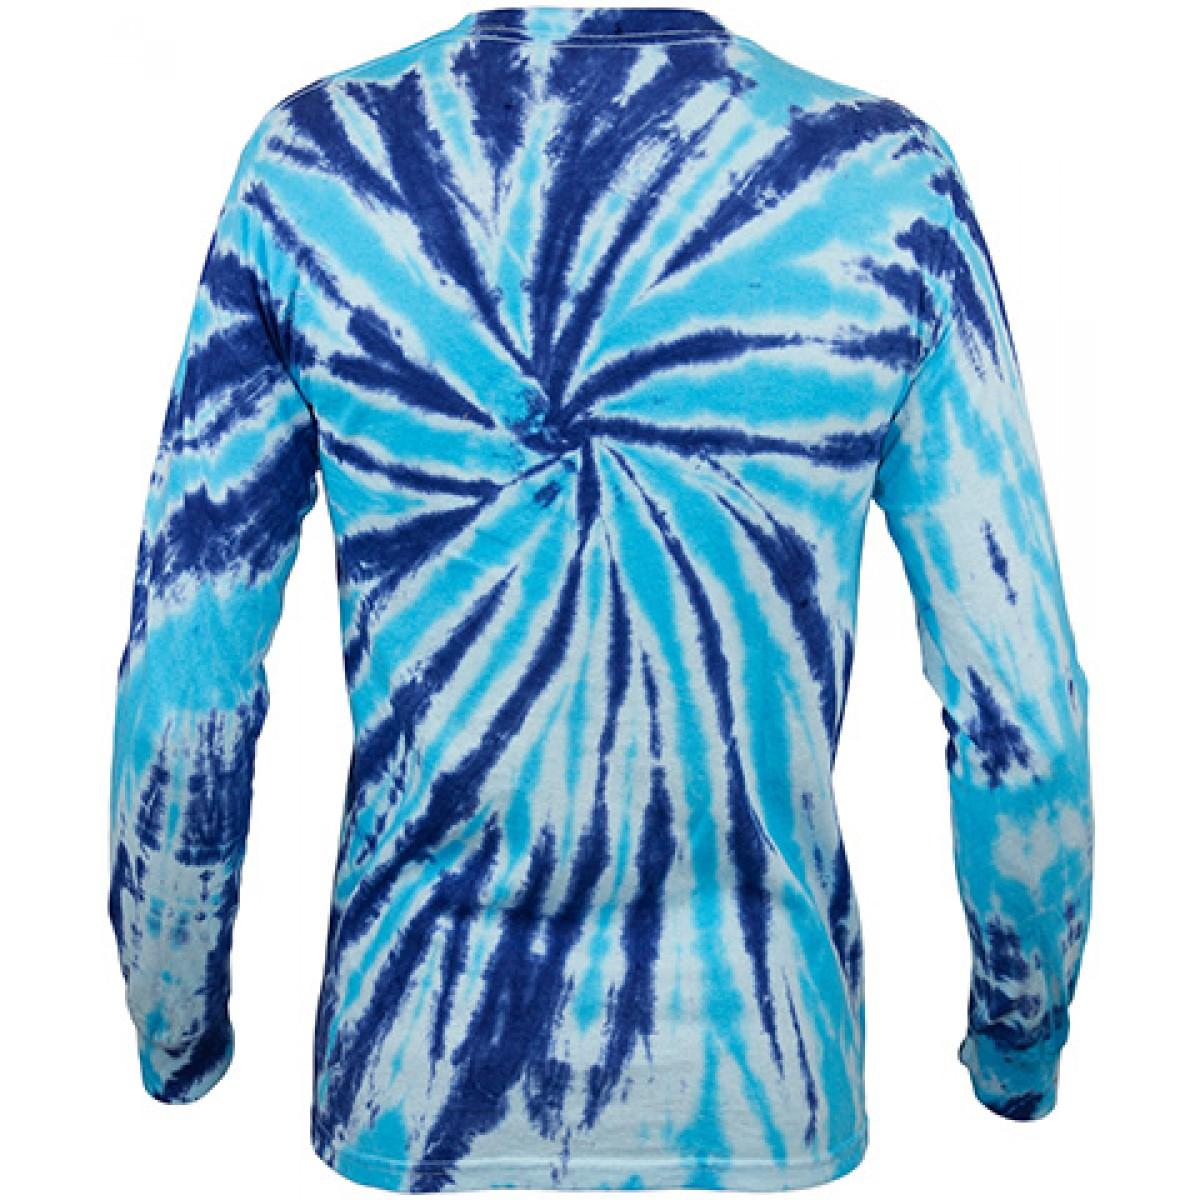 7359aa0d38f Multi Color Tie-Dye Long Sleeve Shirt -Royal Blue-2XL